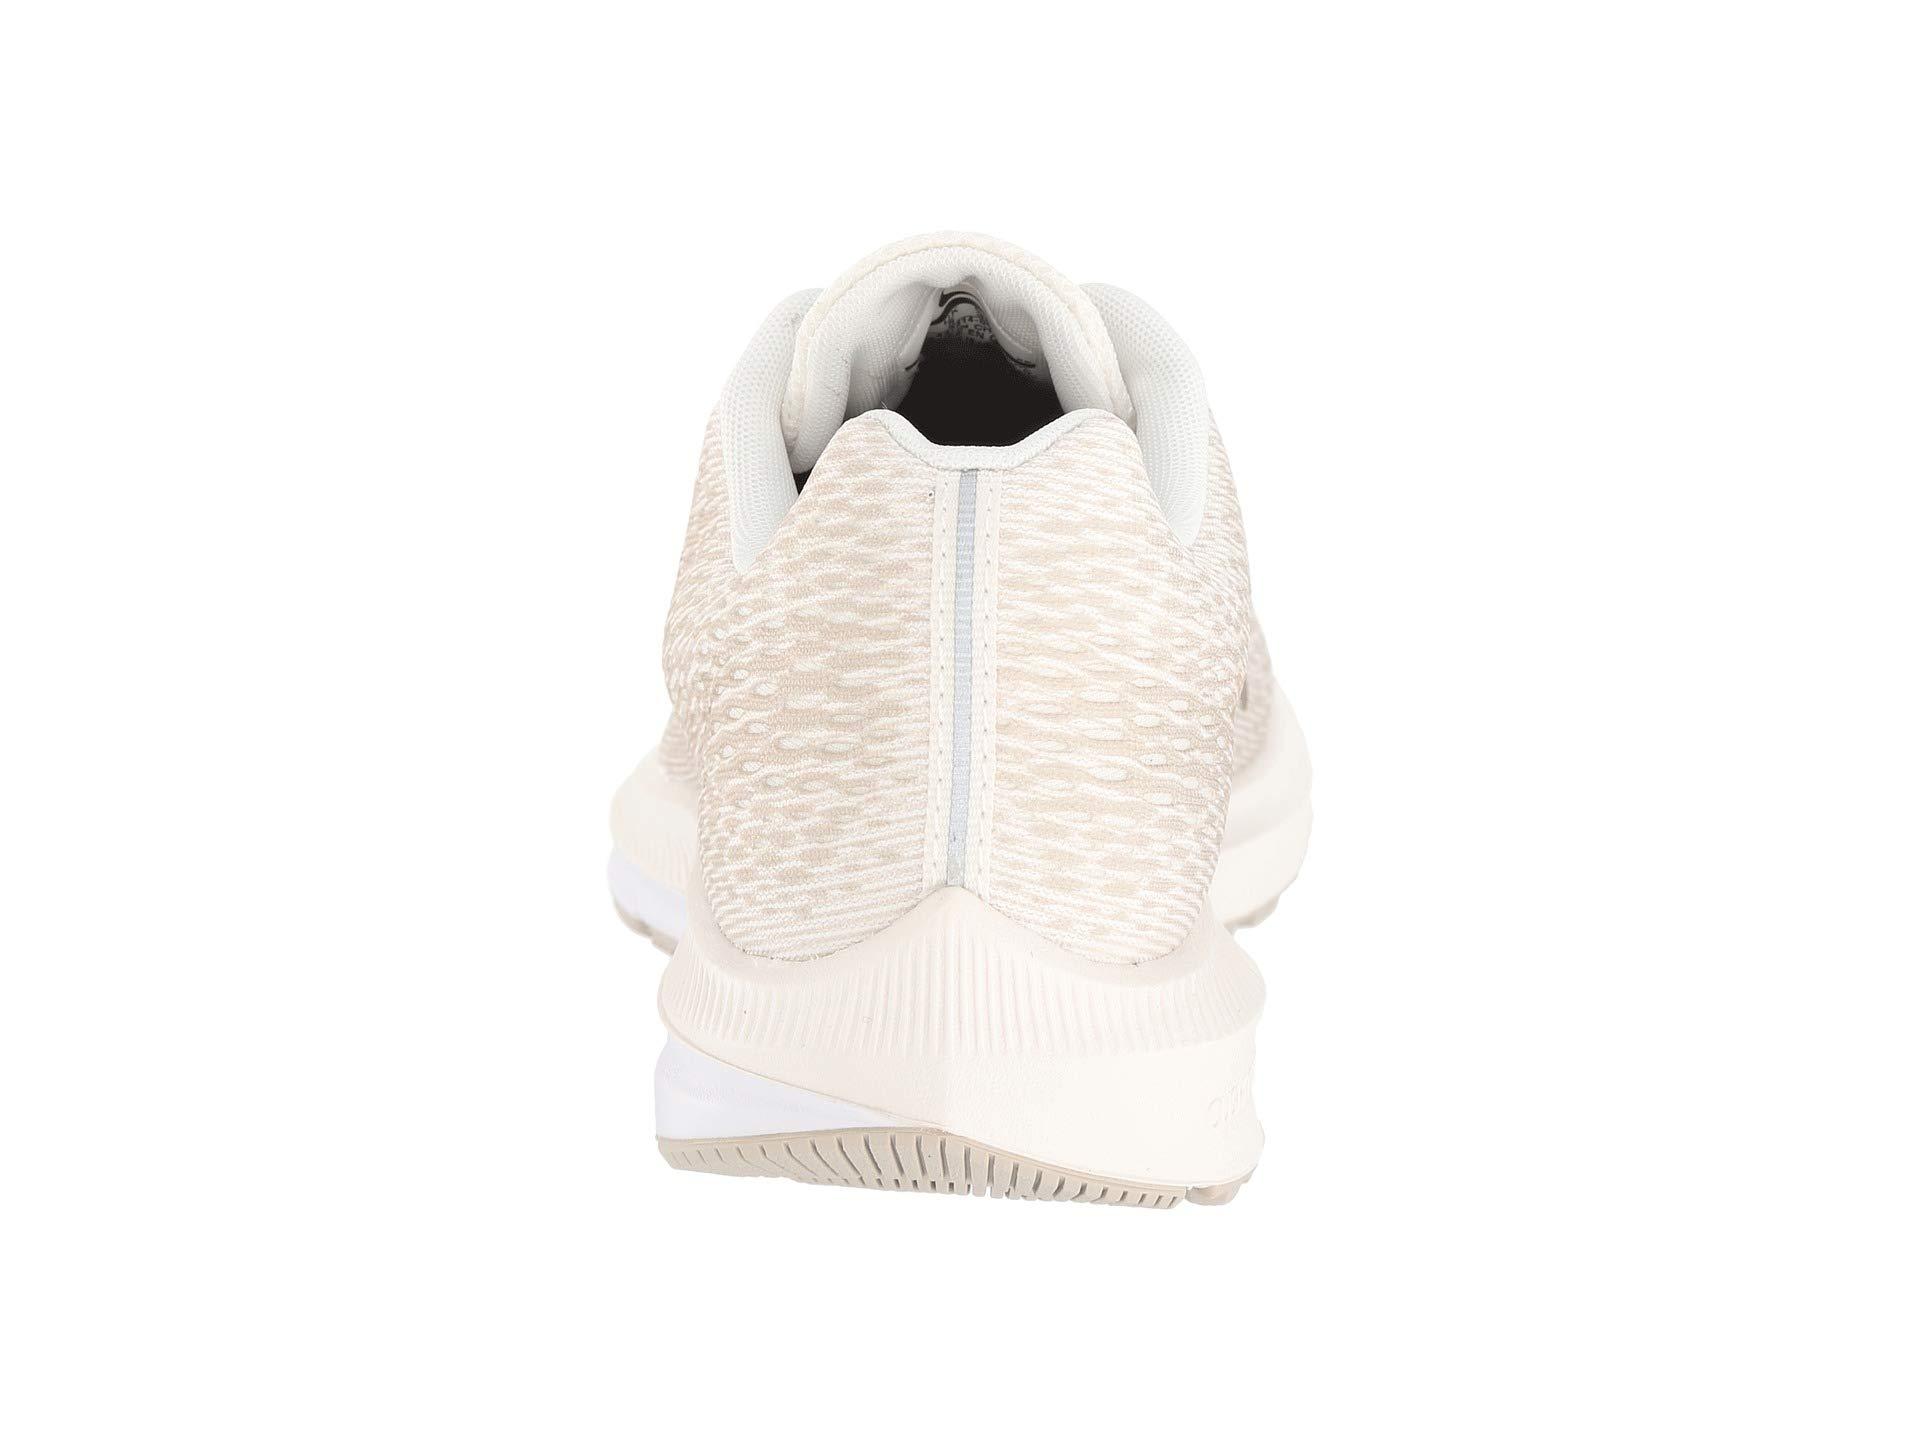 metallic Air string Nike 5 Winflo white Gold Phantom Zoom xOqZBXnH